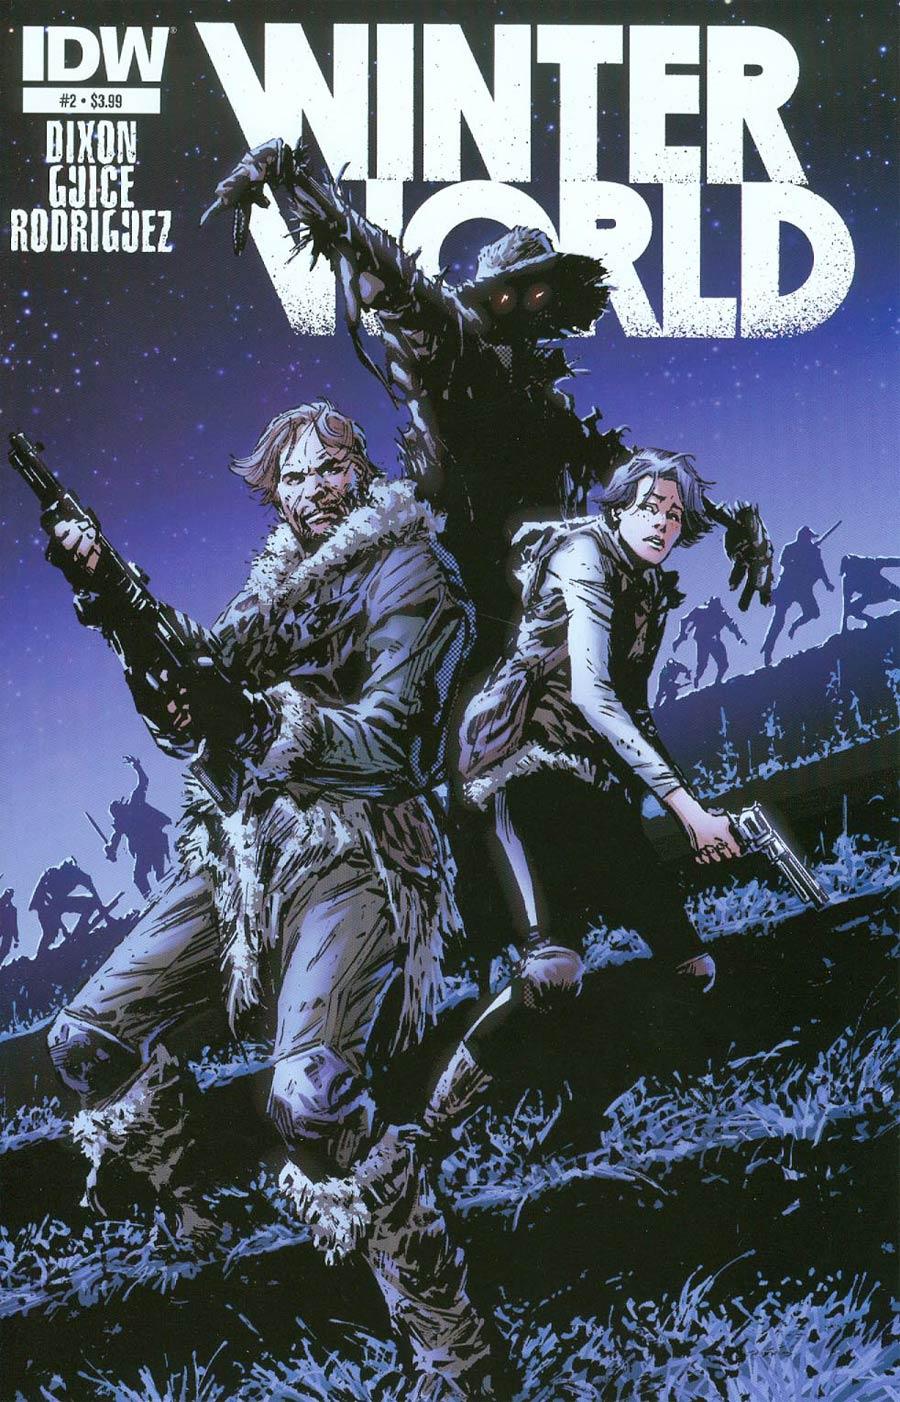 Winterworld Vol 2 #2 Cover A Regular Butch Guice Cover